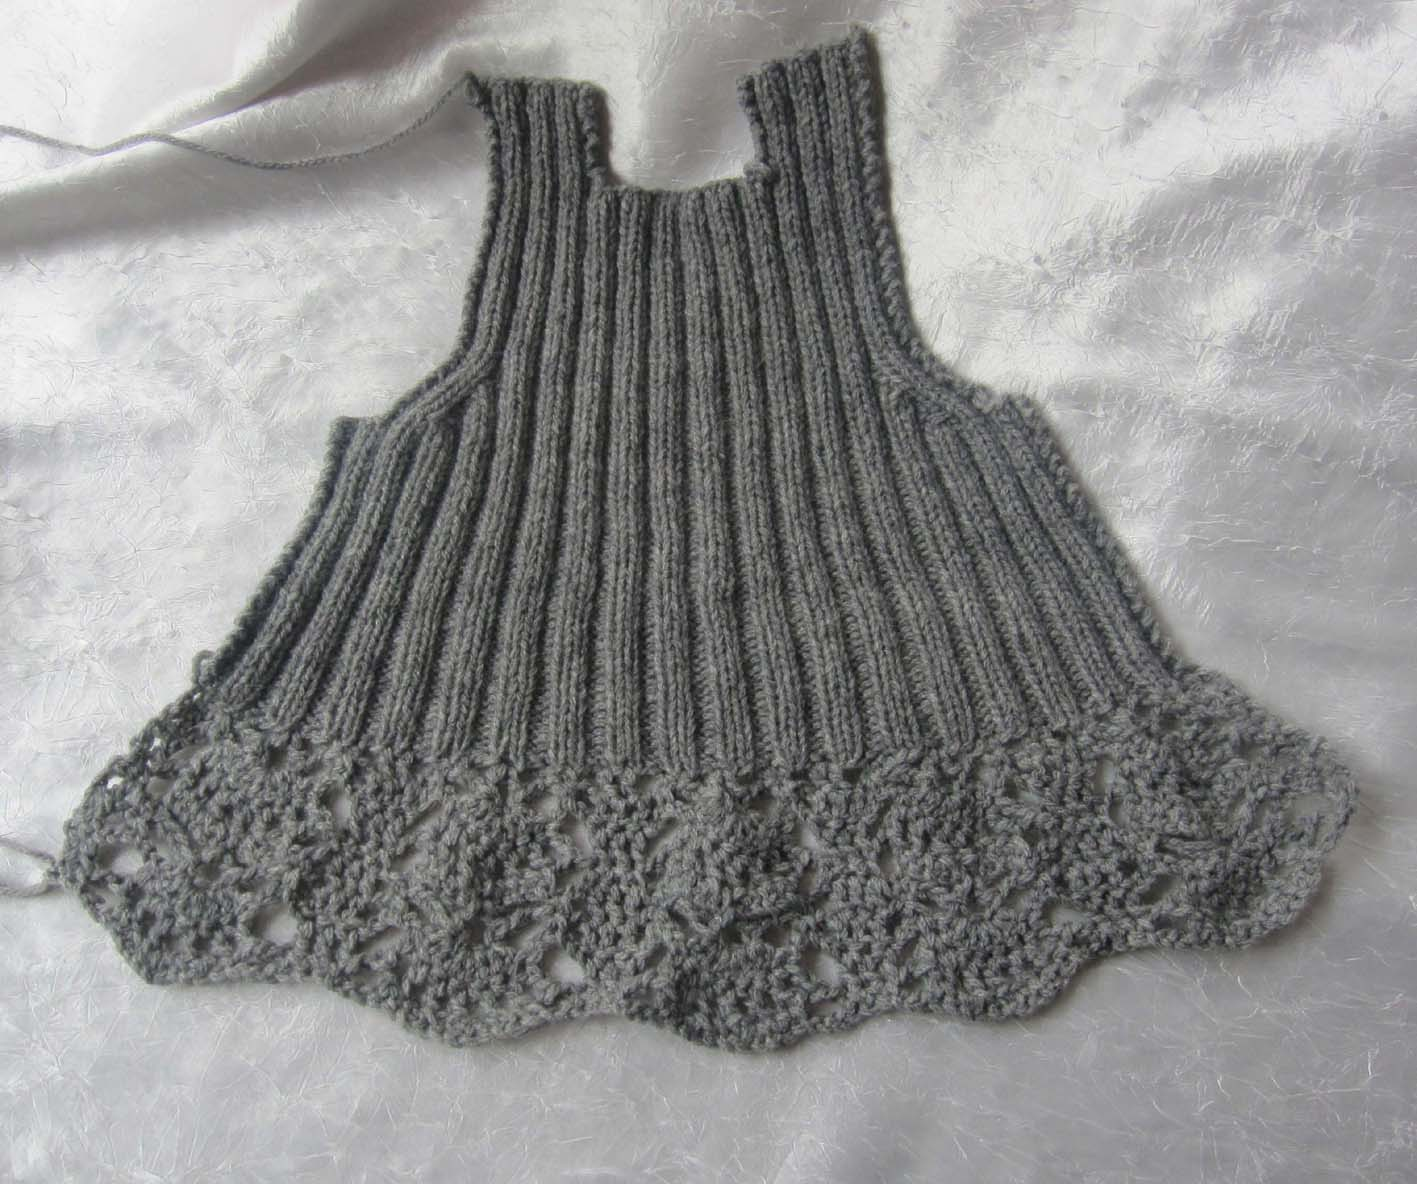 Outstanding Häkelmuster Kleid Sketch - Decke Stricken Muster ...